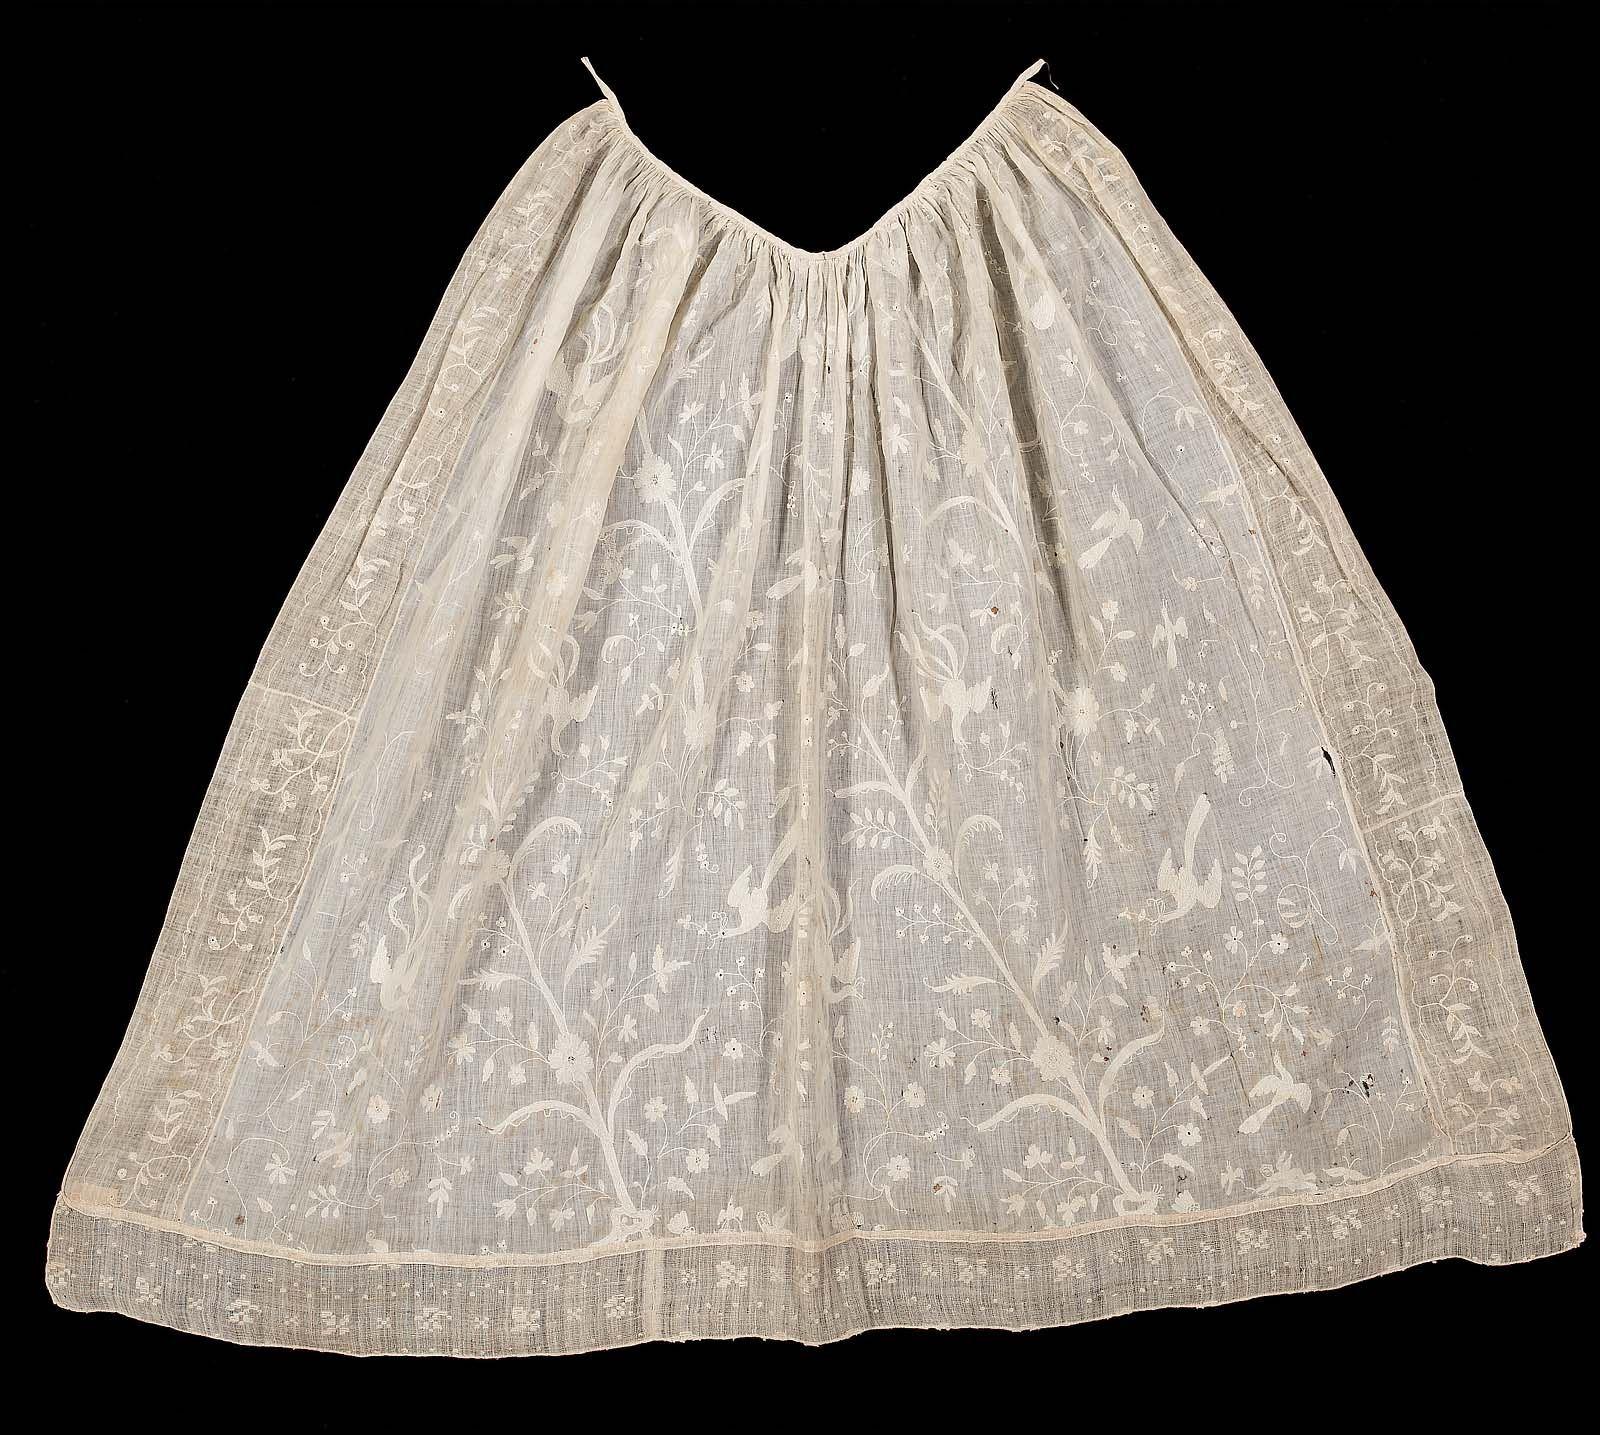 White apron tape - Apron England First Half 18th Century White Cotton Wth Floral White Silk Embroidery